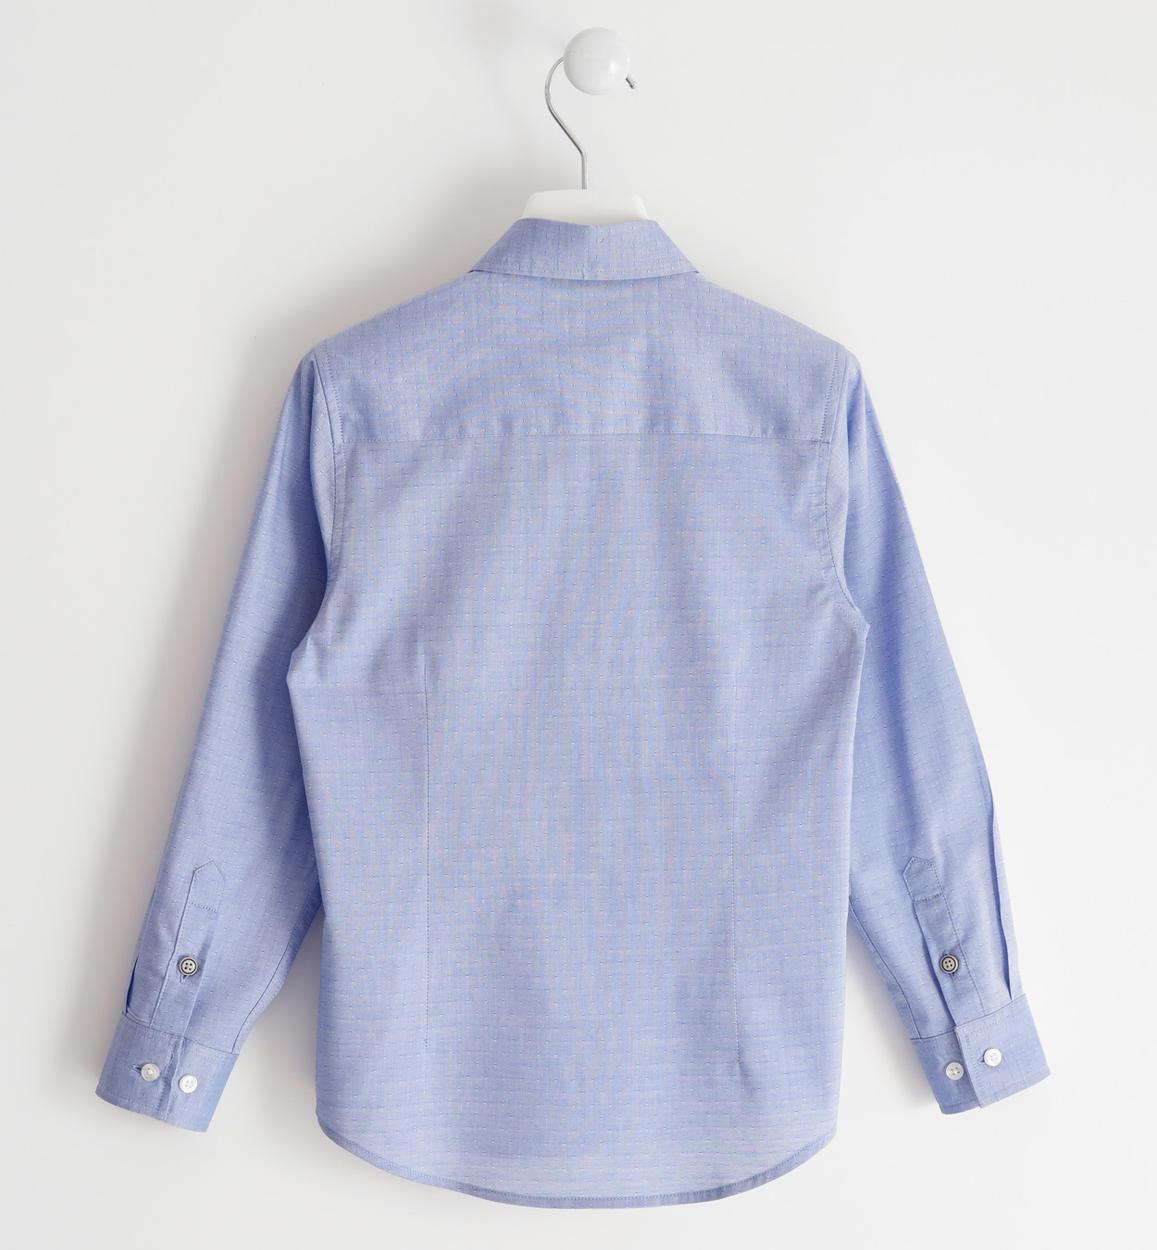 camicia a manica lunga 100 cotone per b avion retro 02 2320j30300 3621 150x150